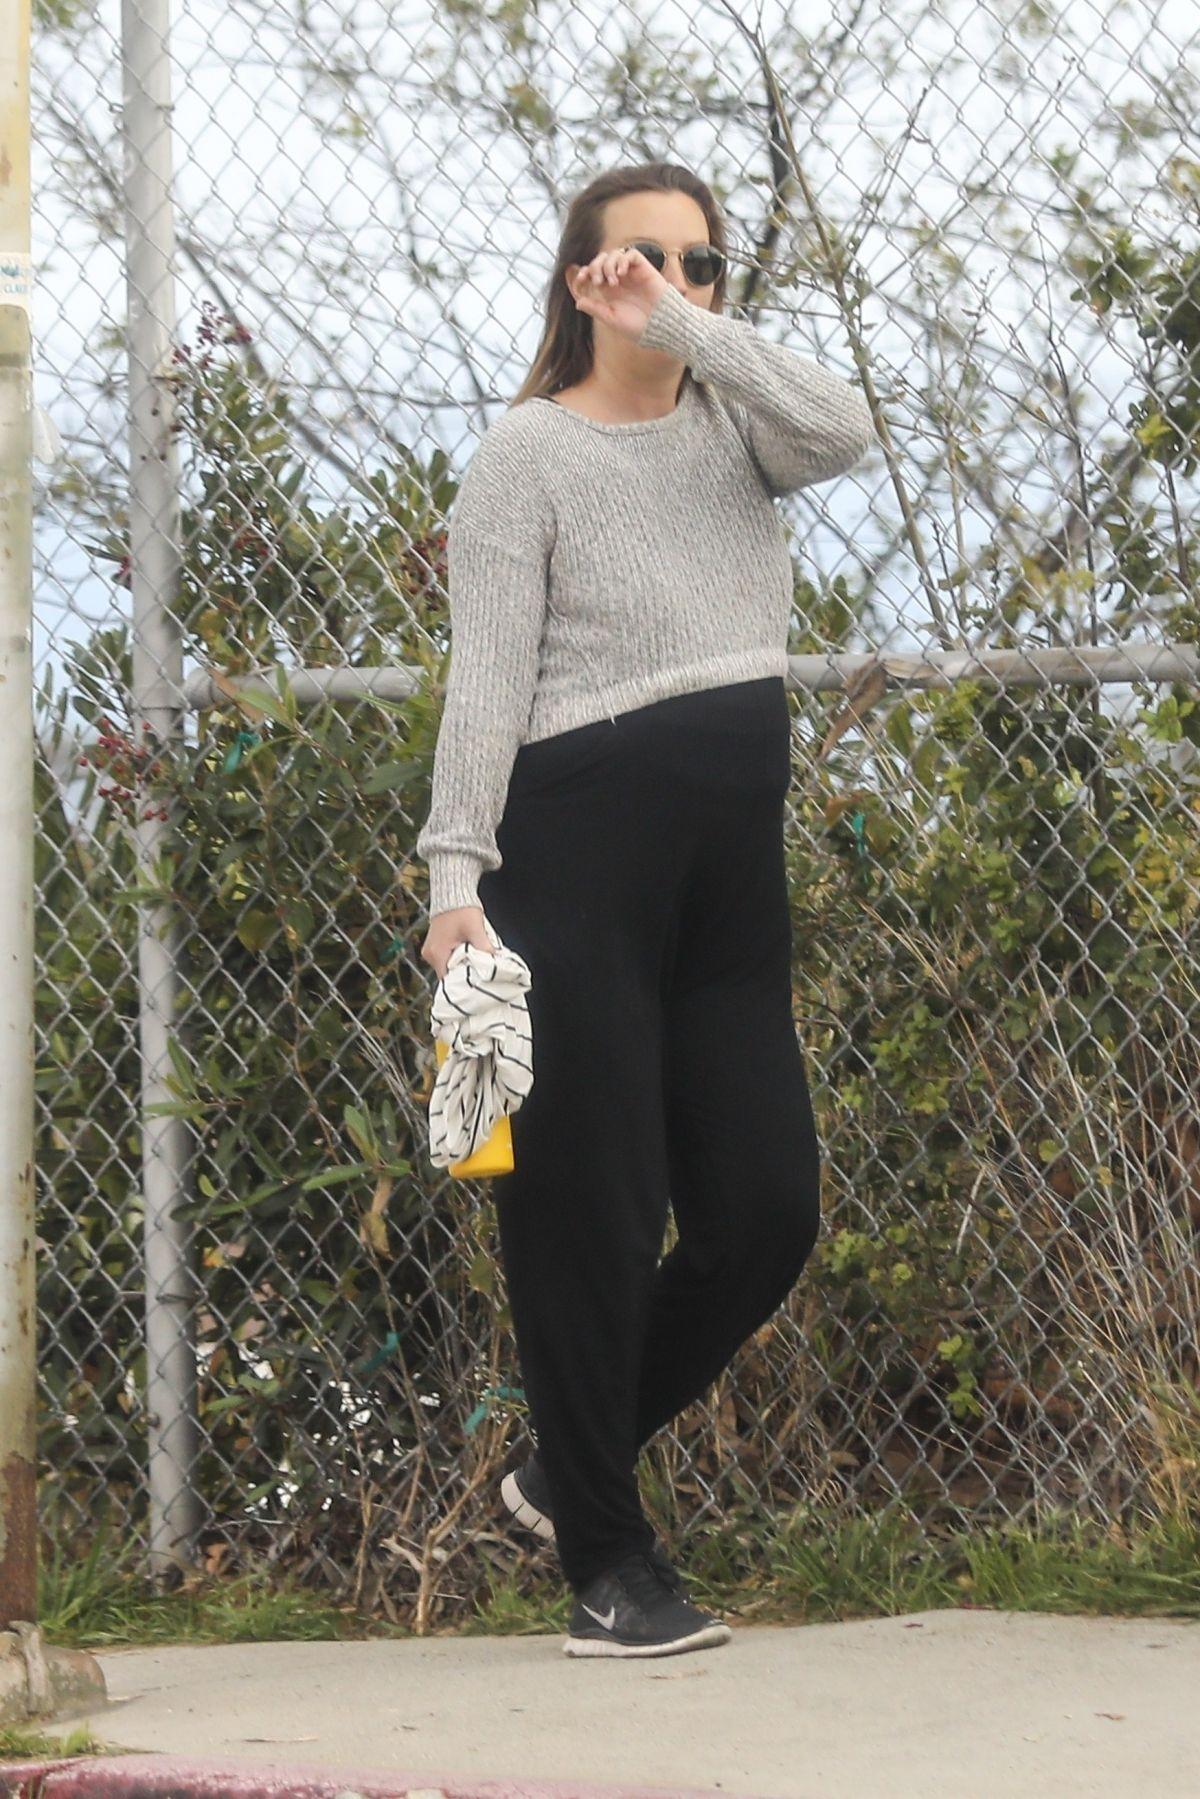 Leighton Meester Pregnant